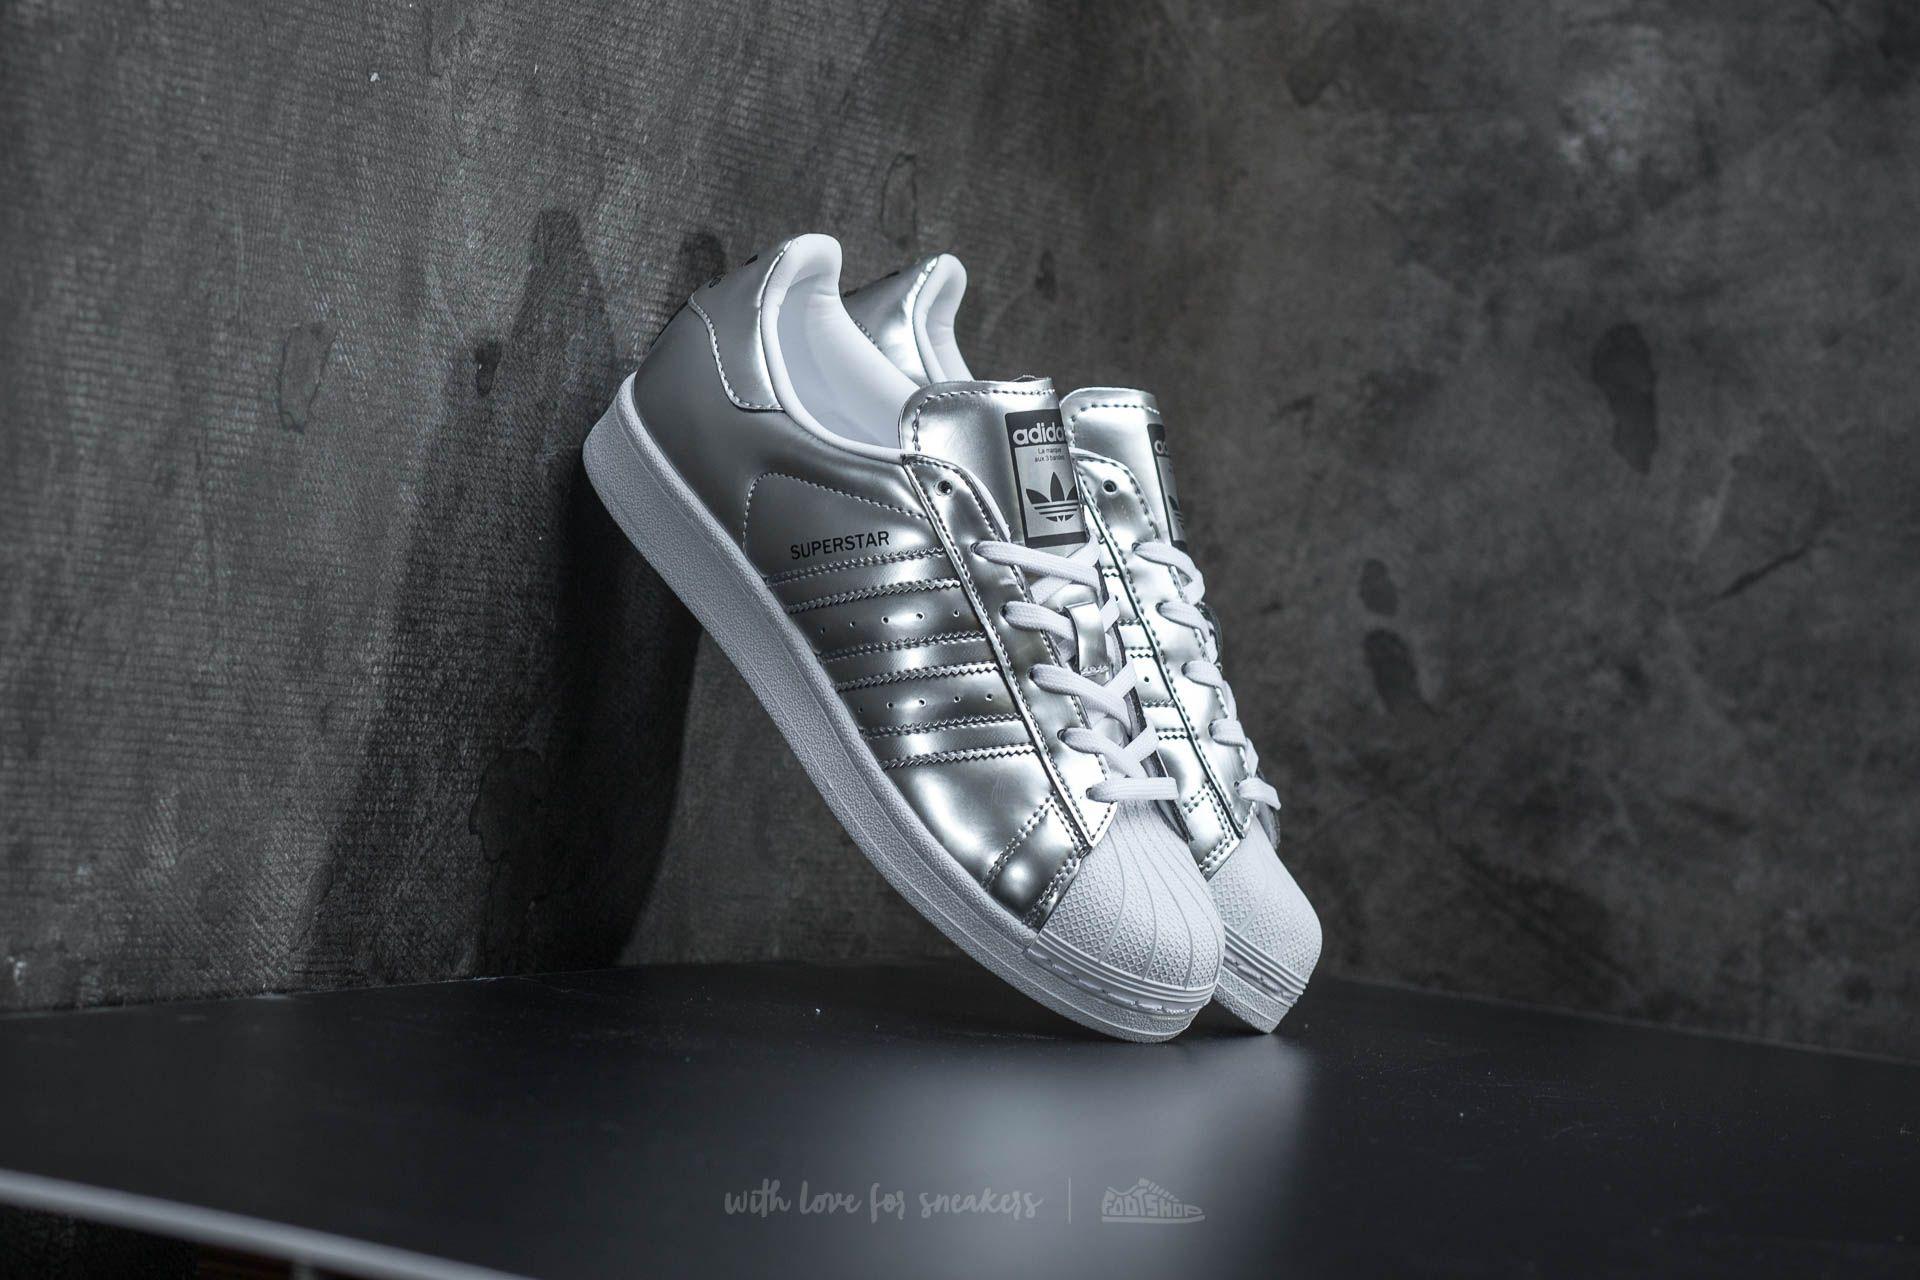 new arrival 5b7de f619a adidas Superstar W Silver Metallic/ Ftw White   Footshop